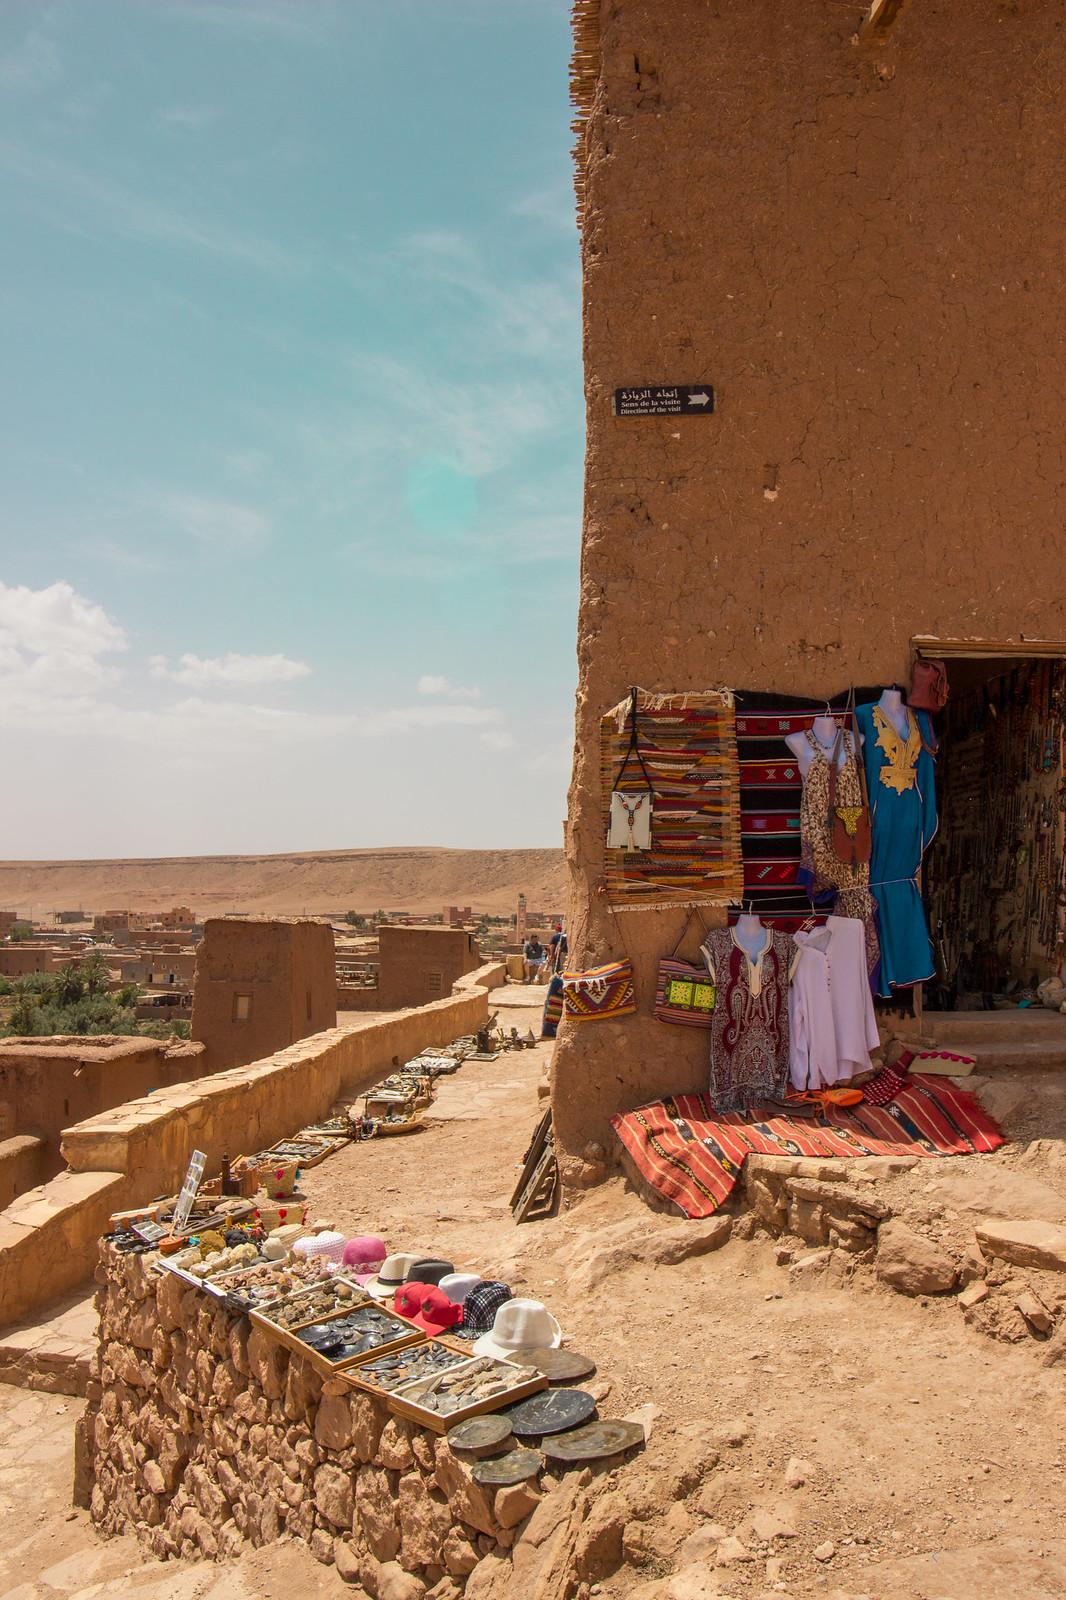 A tourist shop in Ait Ben Haddou